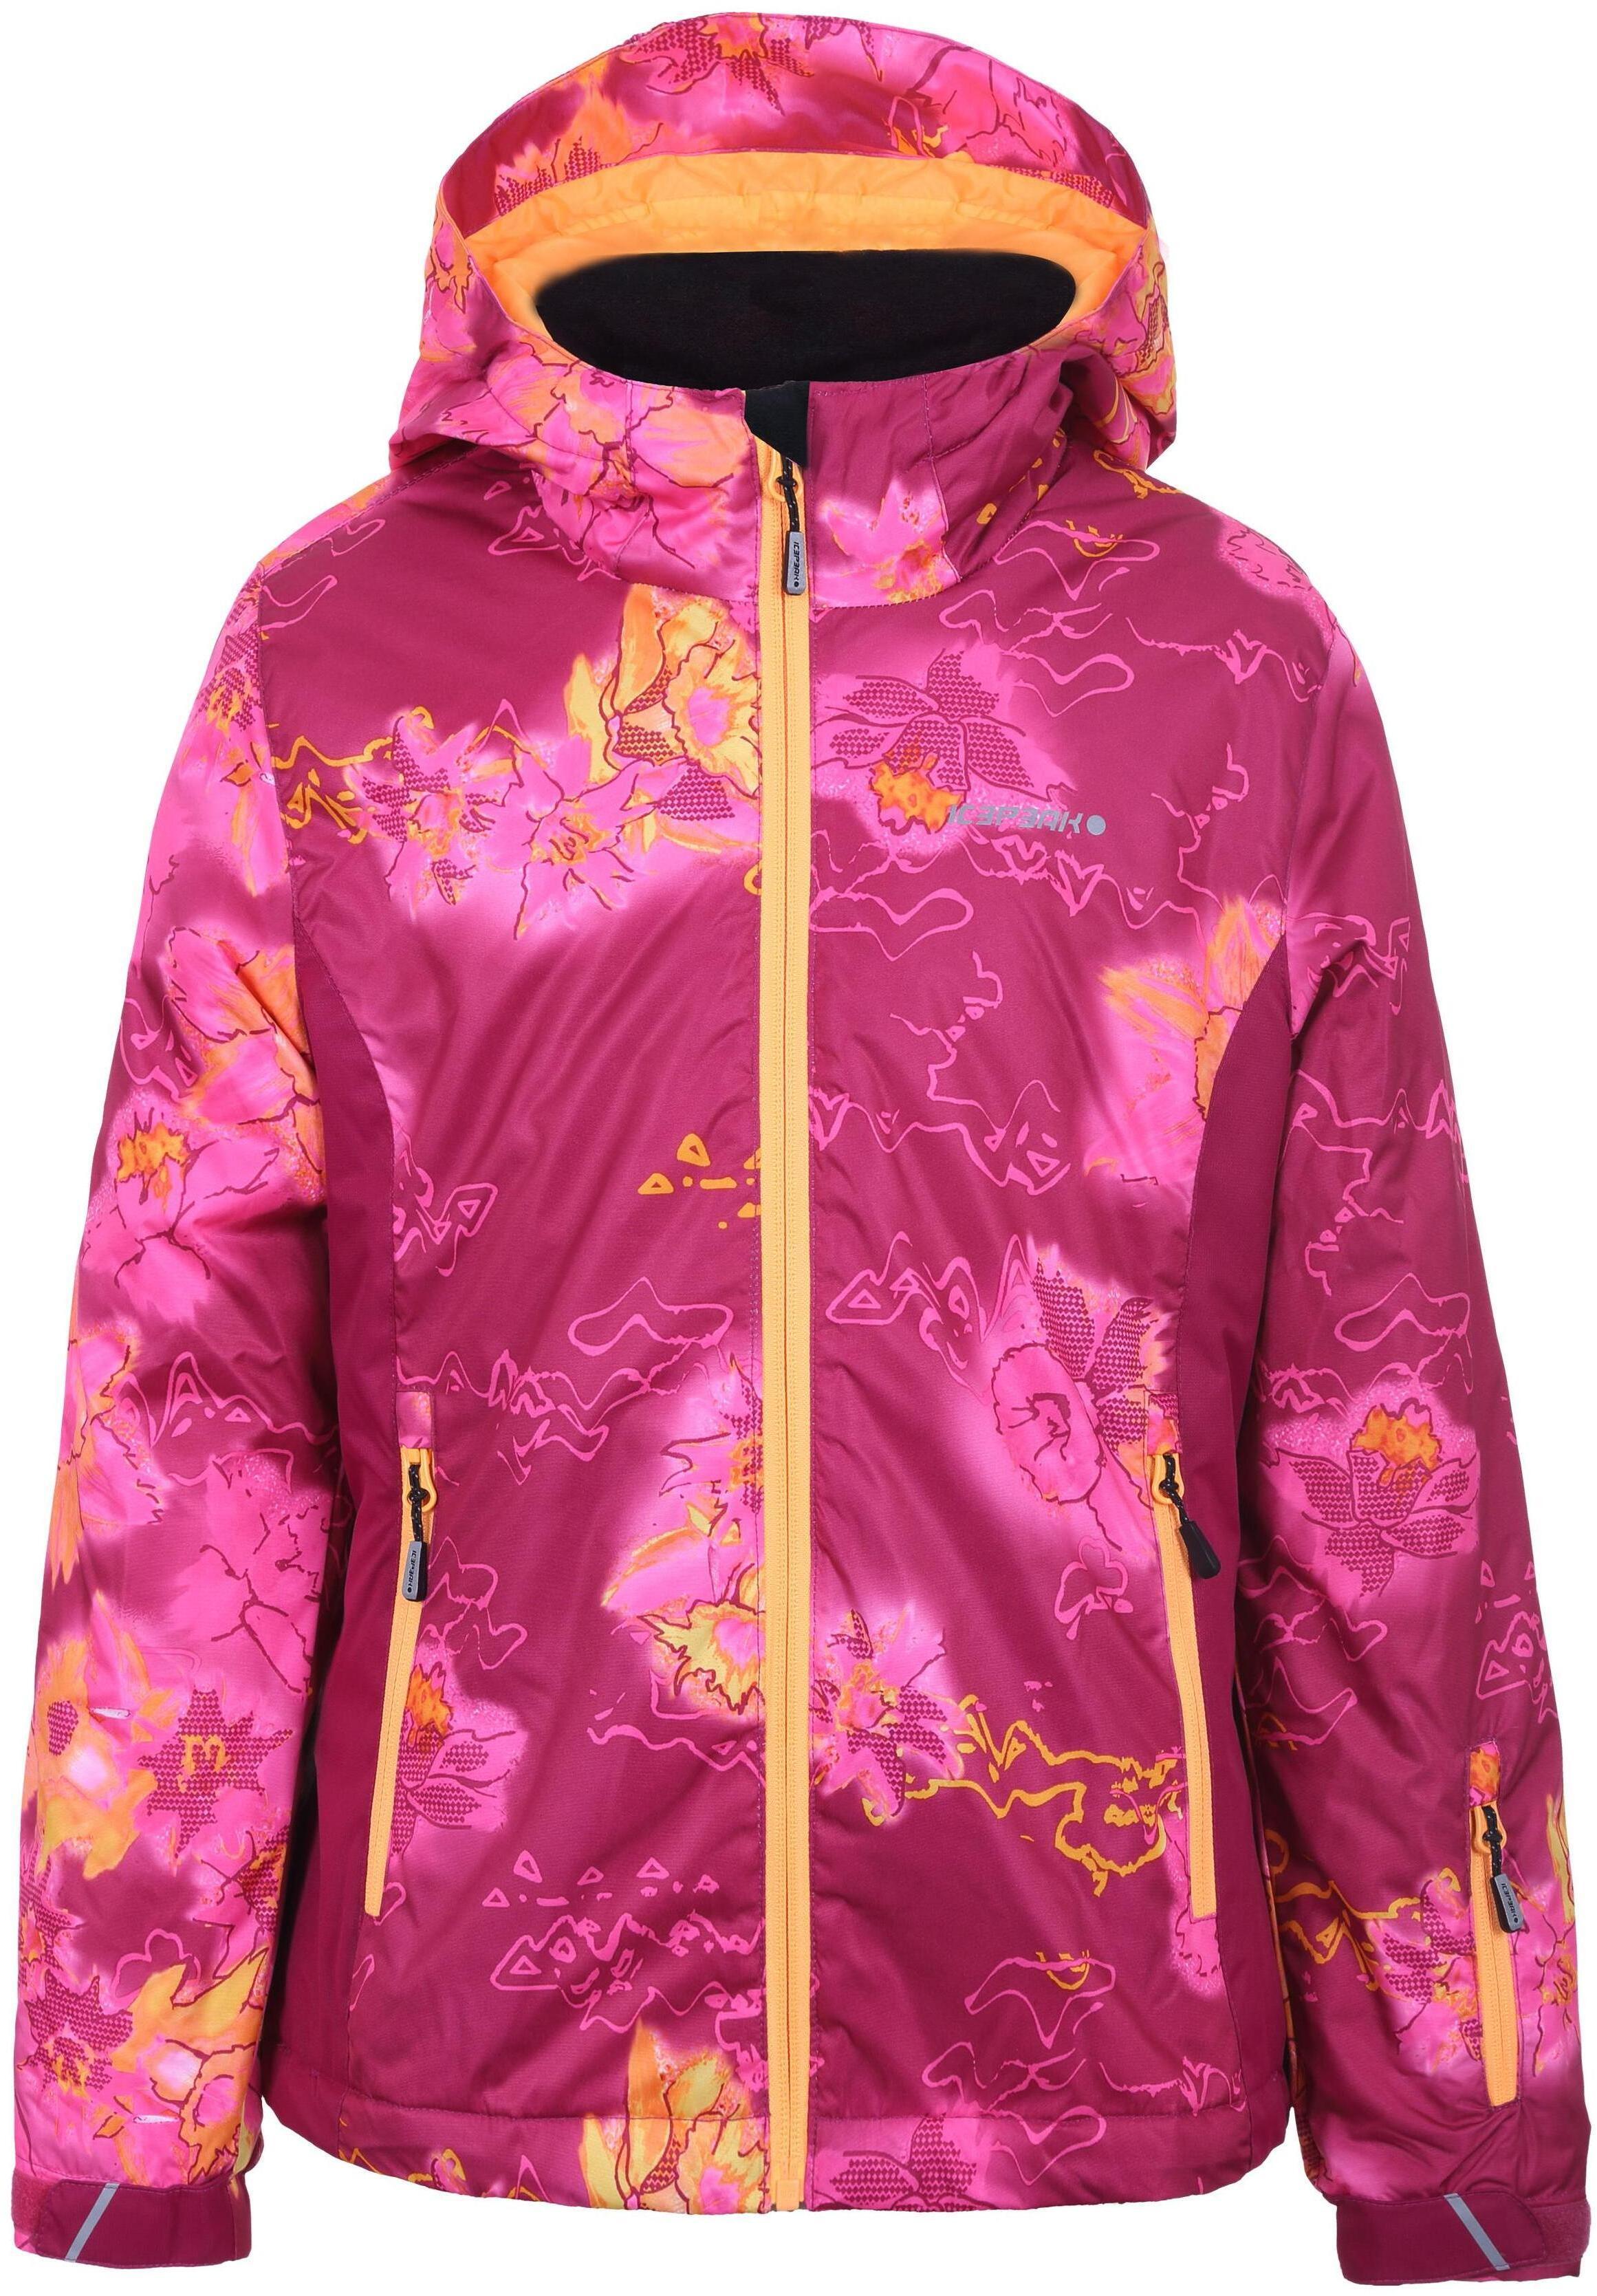 Купить Куртка горнолыжная Icepeak 2019-20 Linn Jr Hot Pink, р. 164,